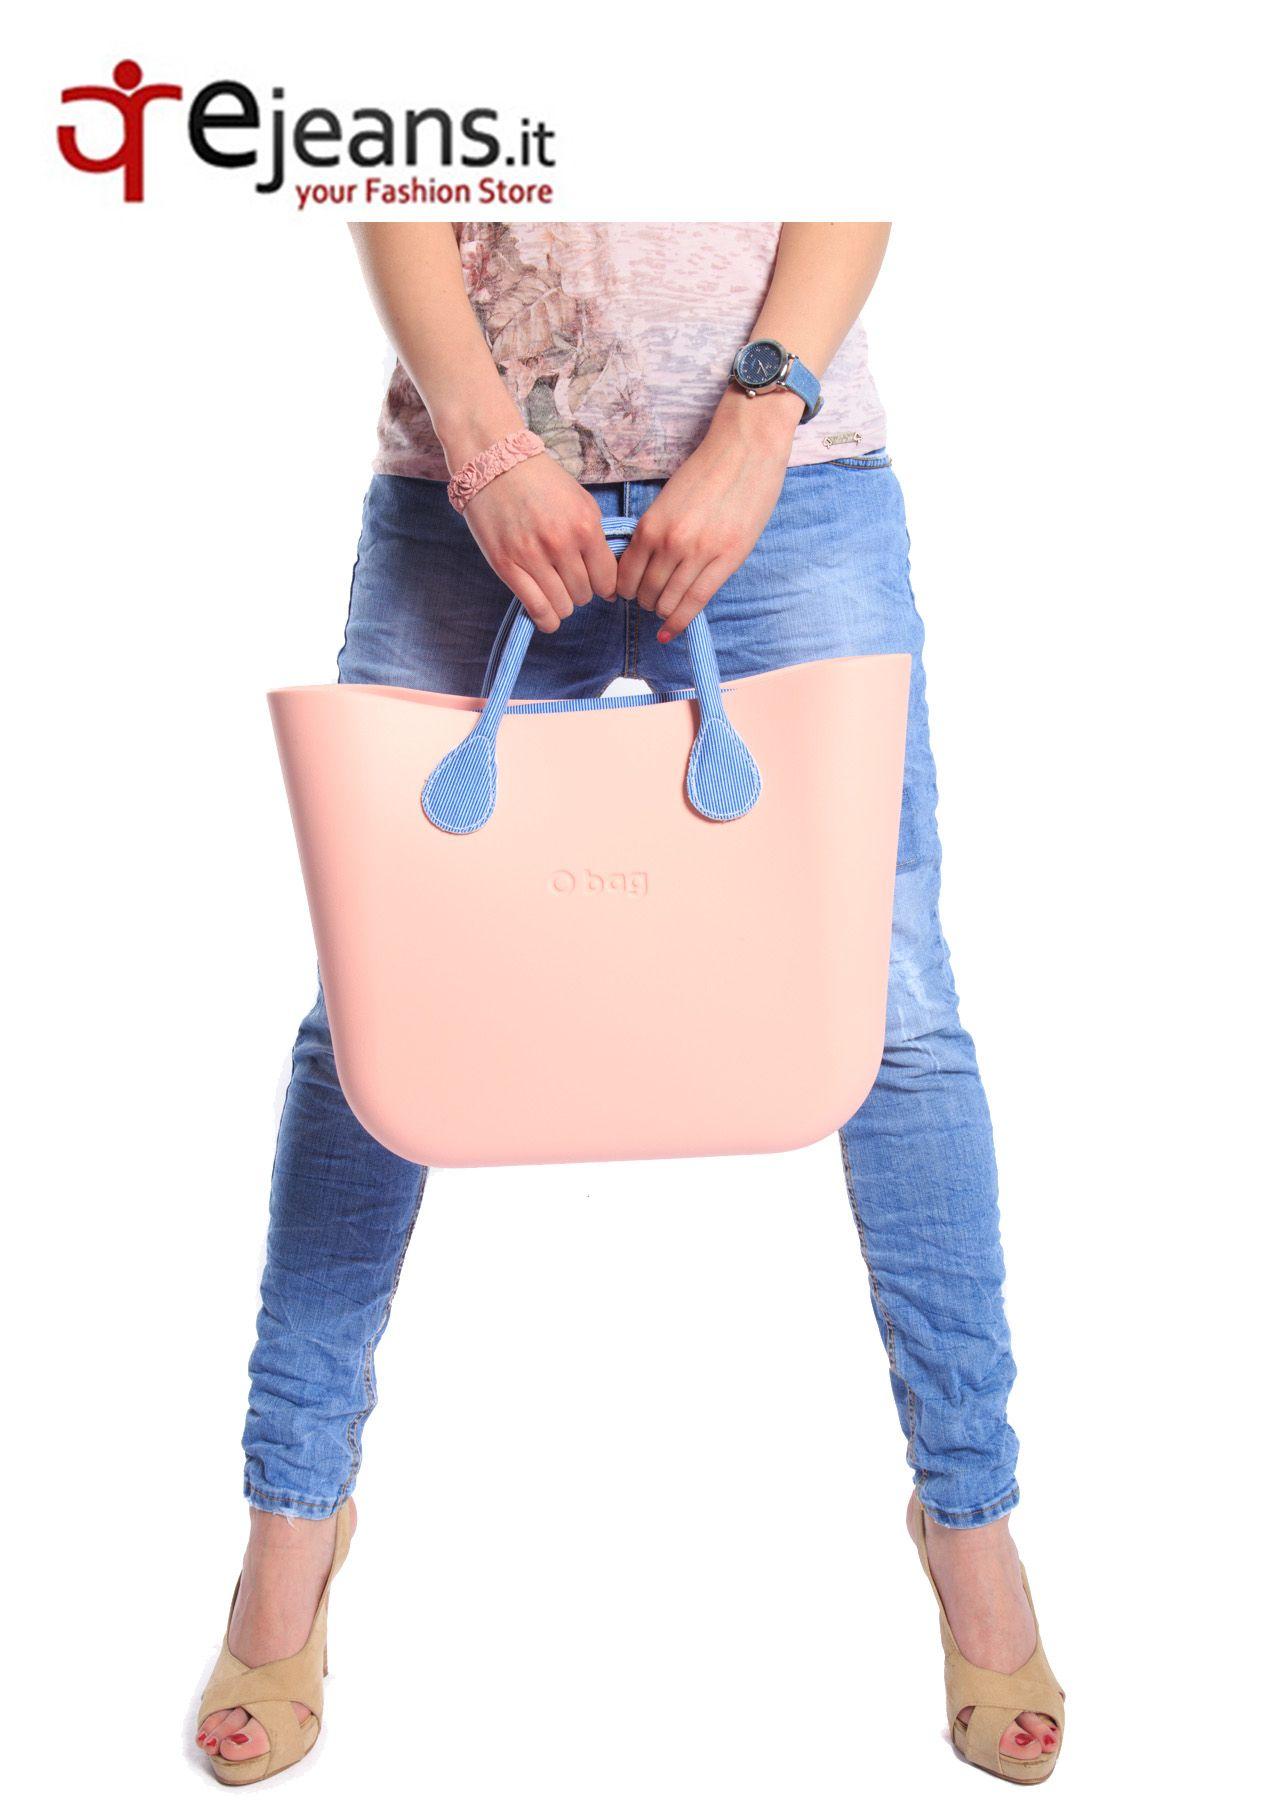 #Jeans e #T-Shirt #MARYLEY Shop now!! ,http://www.ejeans.it/index.php?id_manufacturer=21&controller=manufacturer FULLSPOT O'BAG, FULLSPOT BRACELET e Orologio in jeans MAREA da Malaguti Ovada Oreficeria